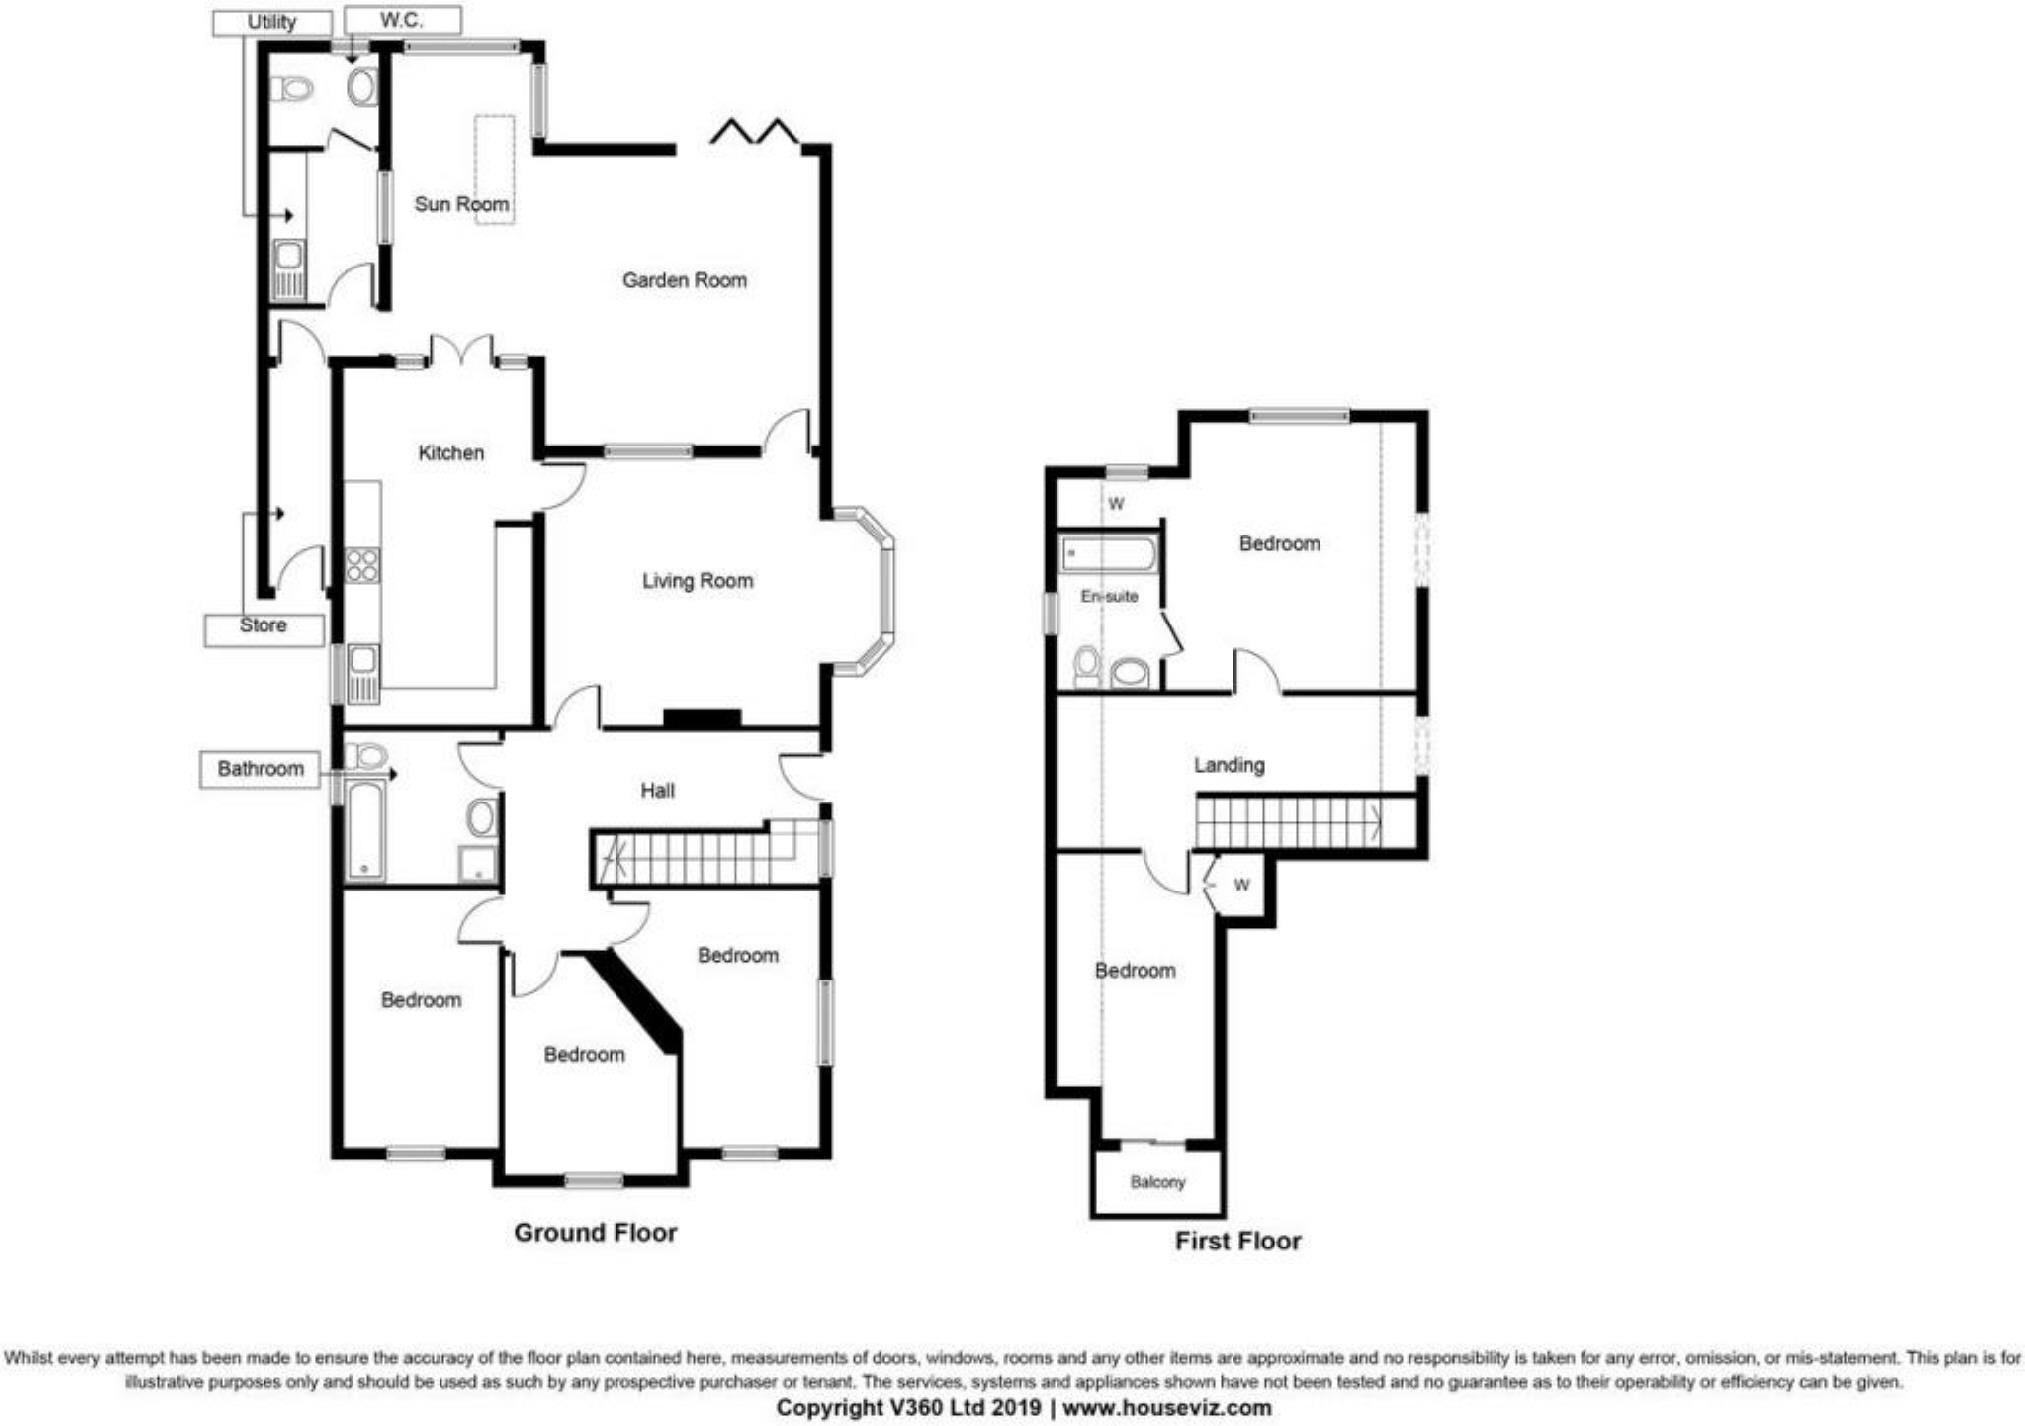 5 bedroom Detached Bungalow for sale in Birstall